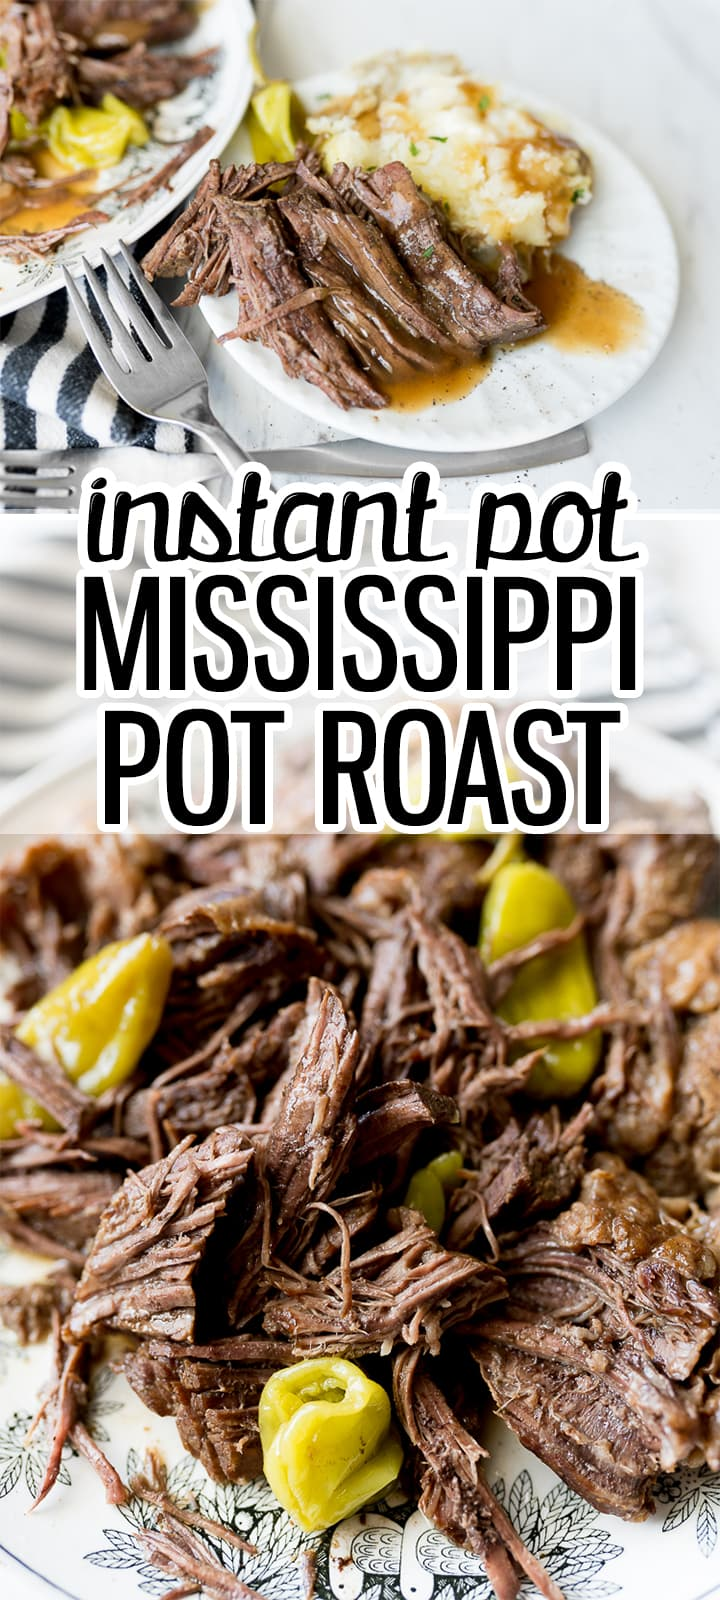 Pin image for Mississippi pot roast Instant Pot